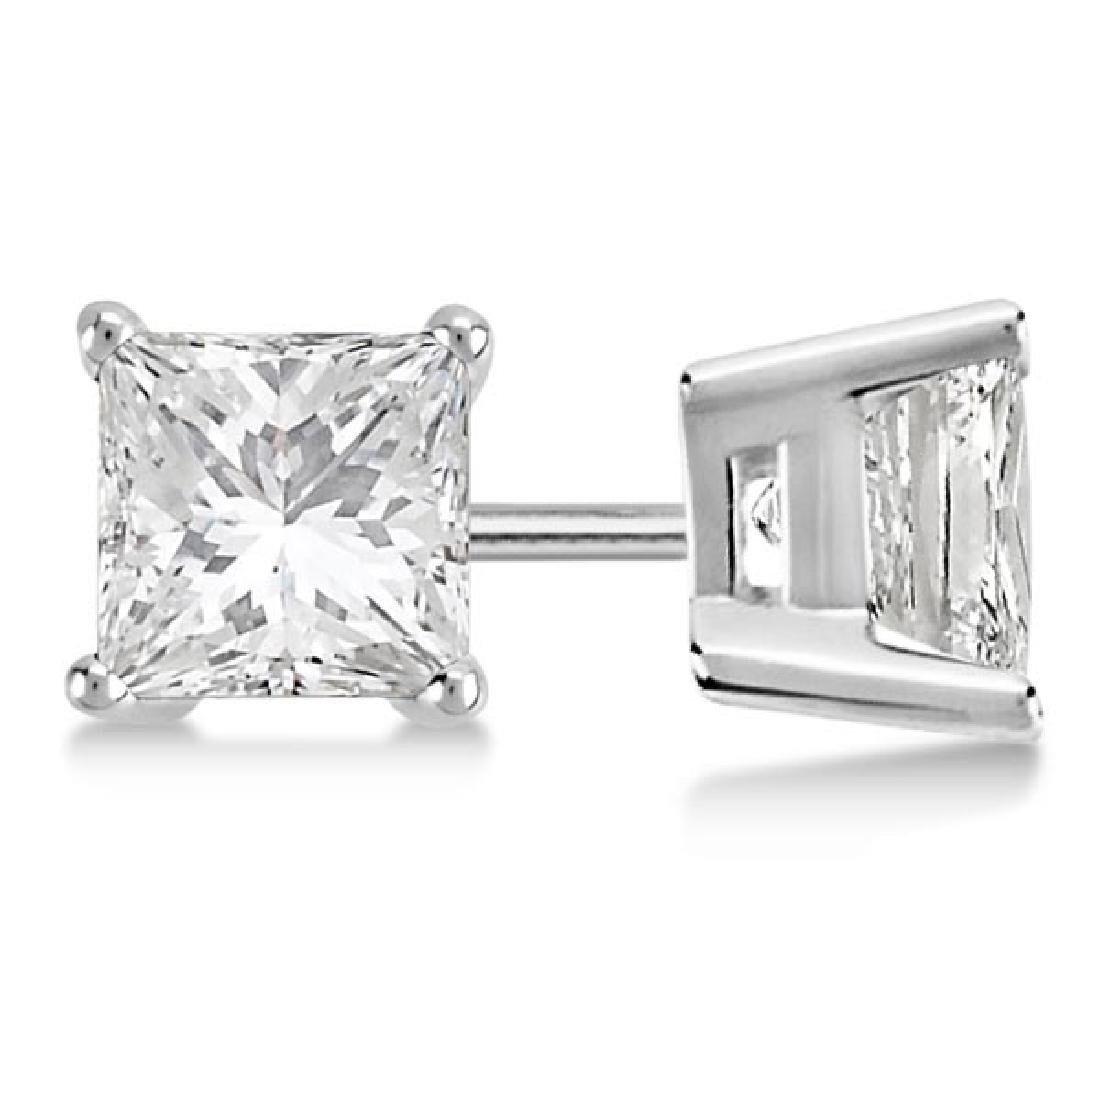 Certified 0.71 CTW Princess Diamond Stud Earrings E/SI2